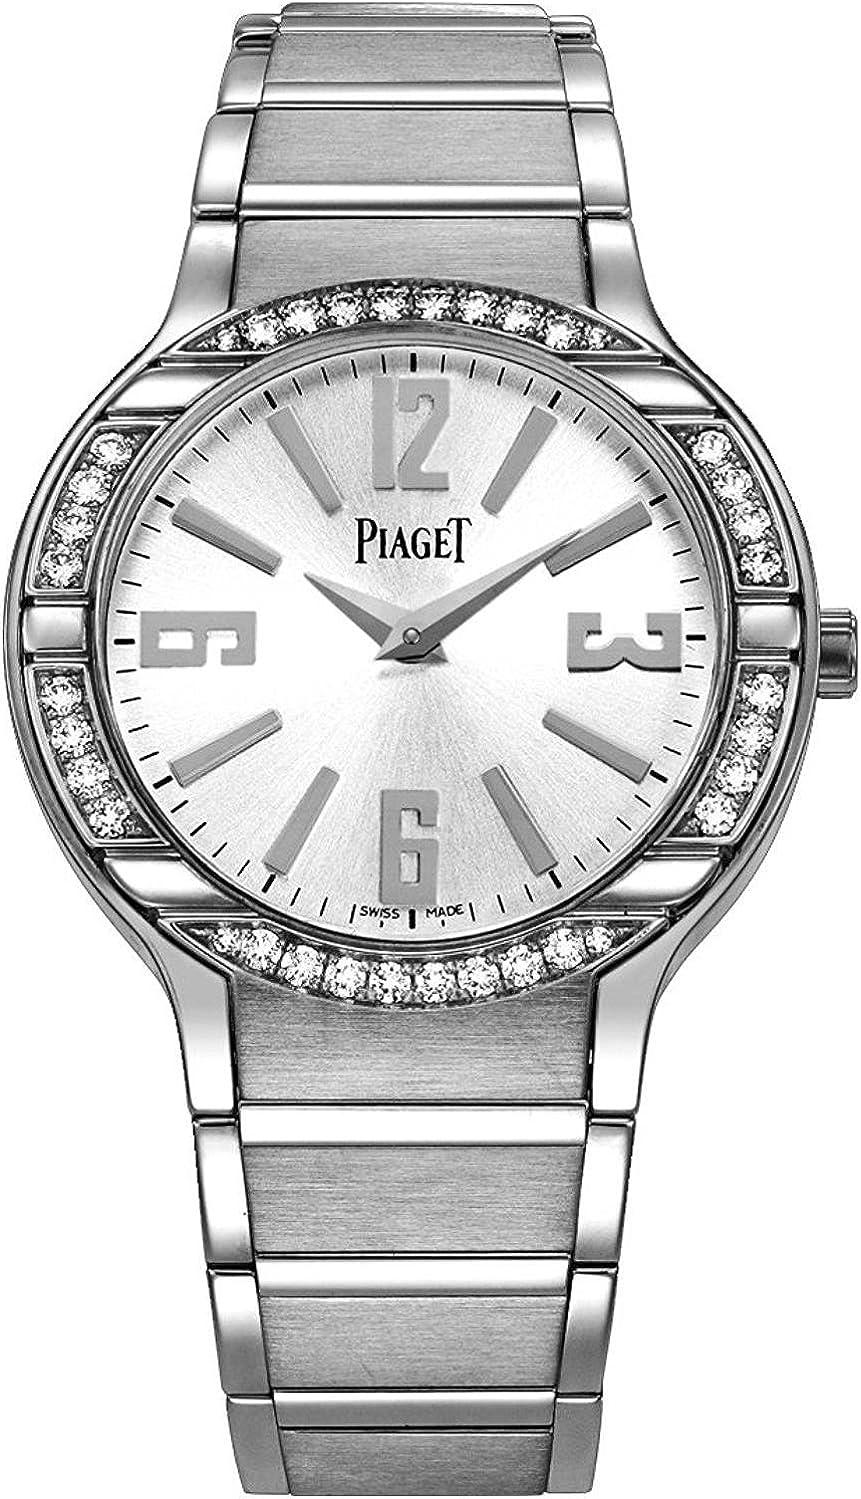 Piaget Polo Women's Silver Dial White Gold Diamond Swiss Made Watch G0A36231